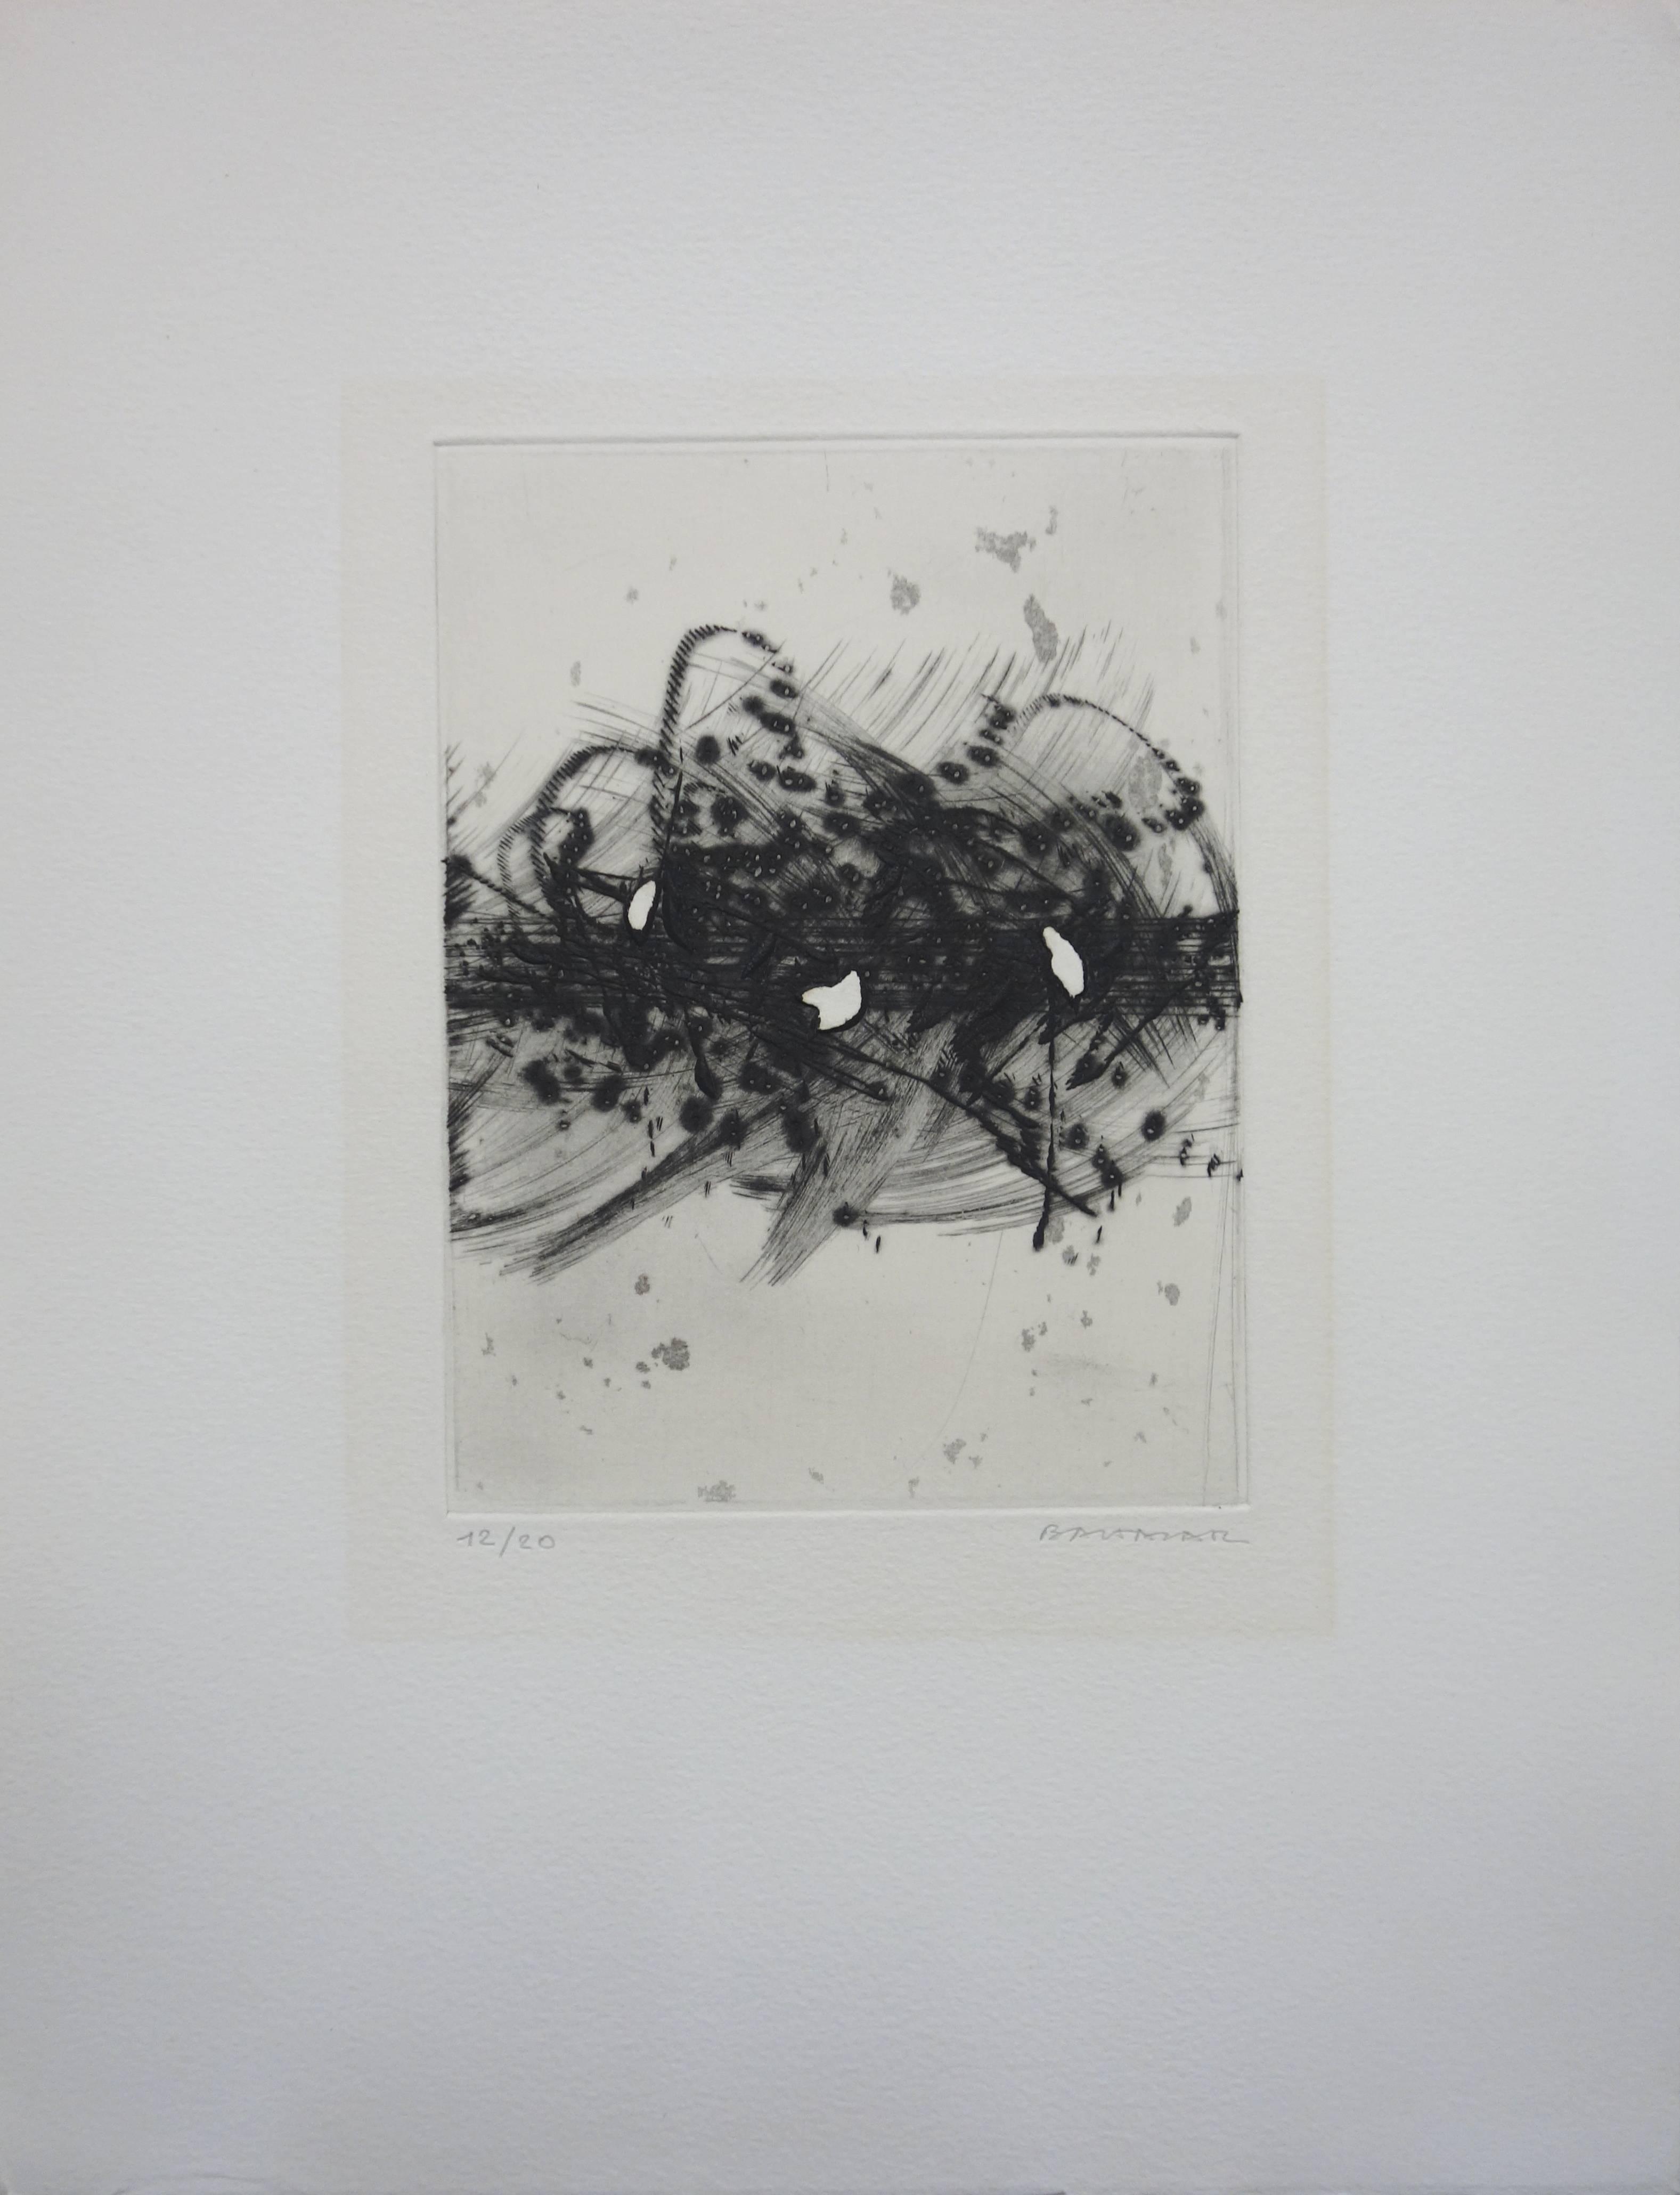 Storm - Original etching - Handsigned